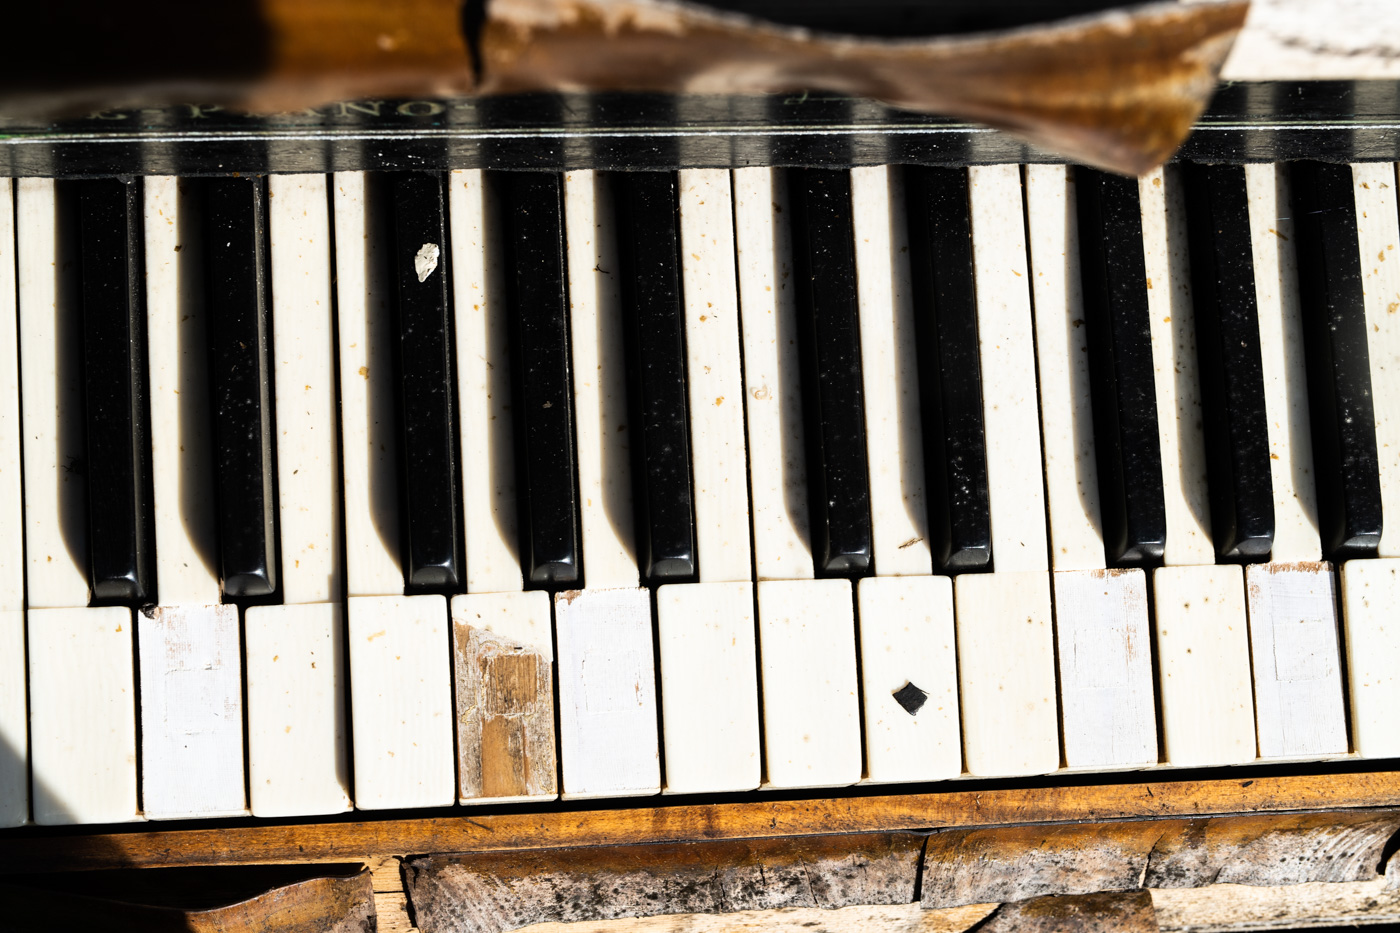 klavier am attersee